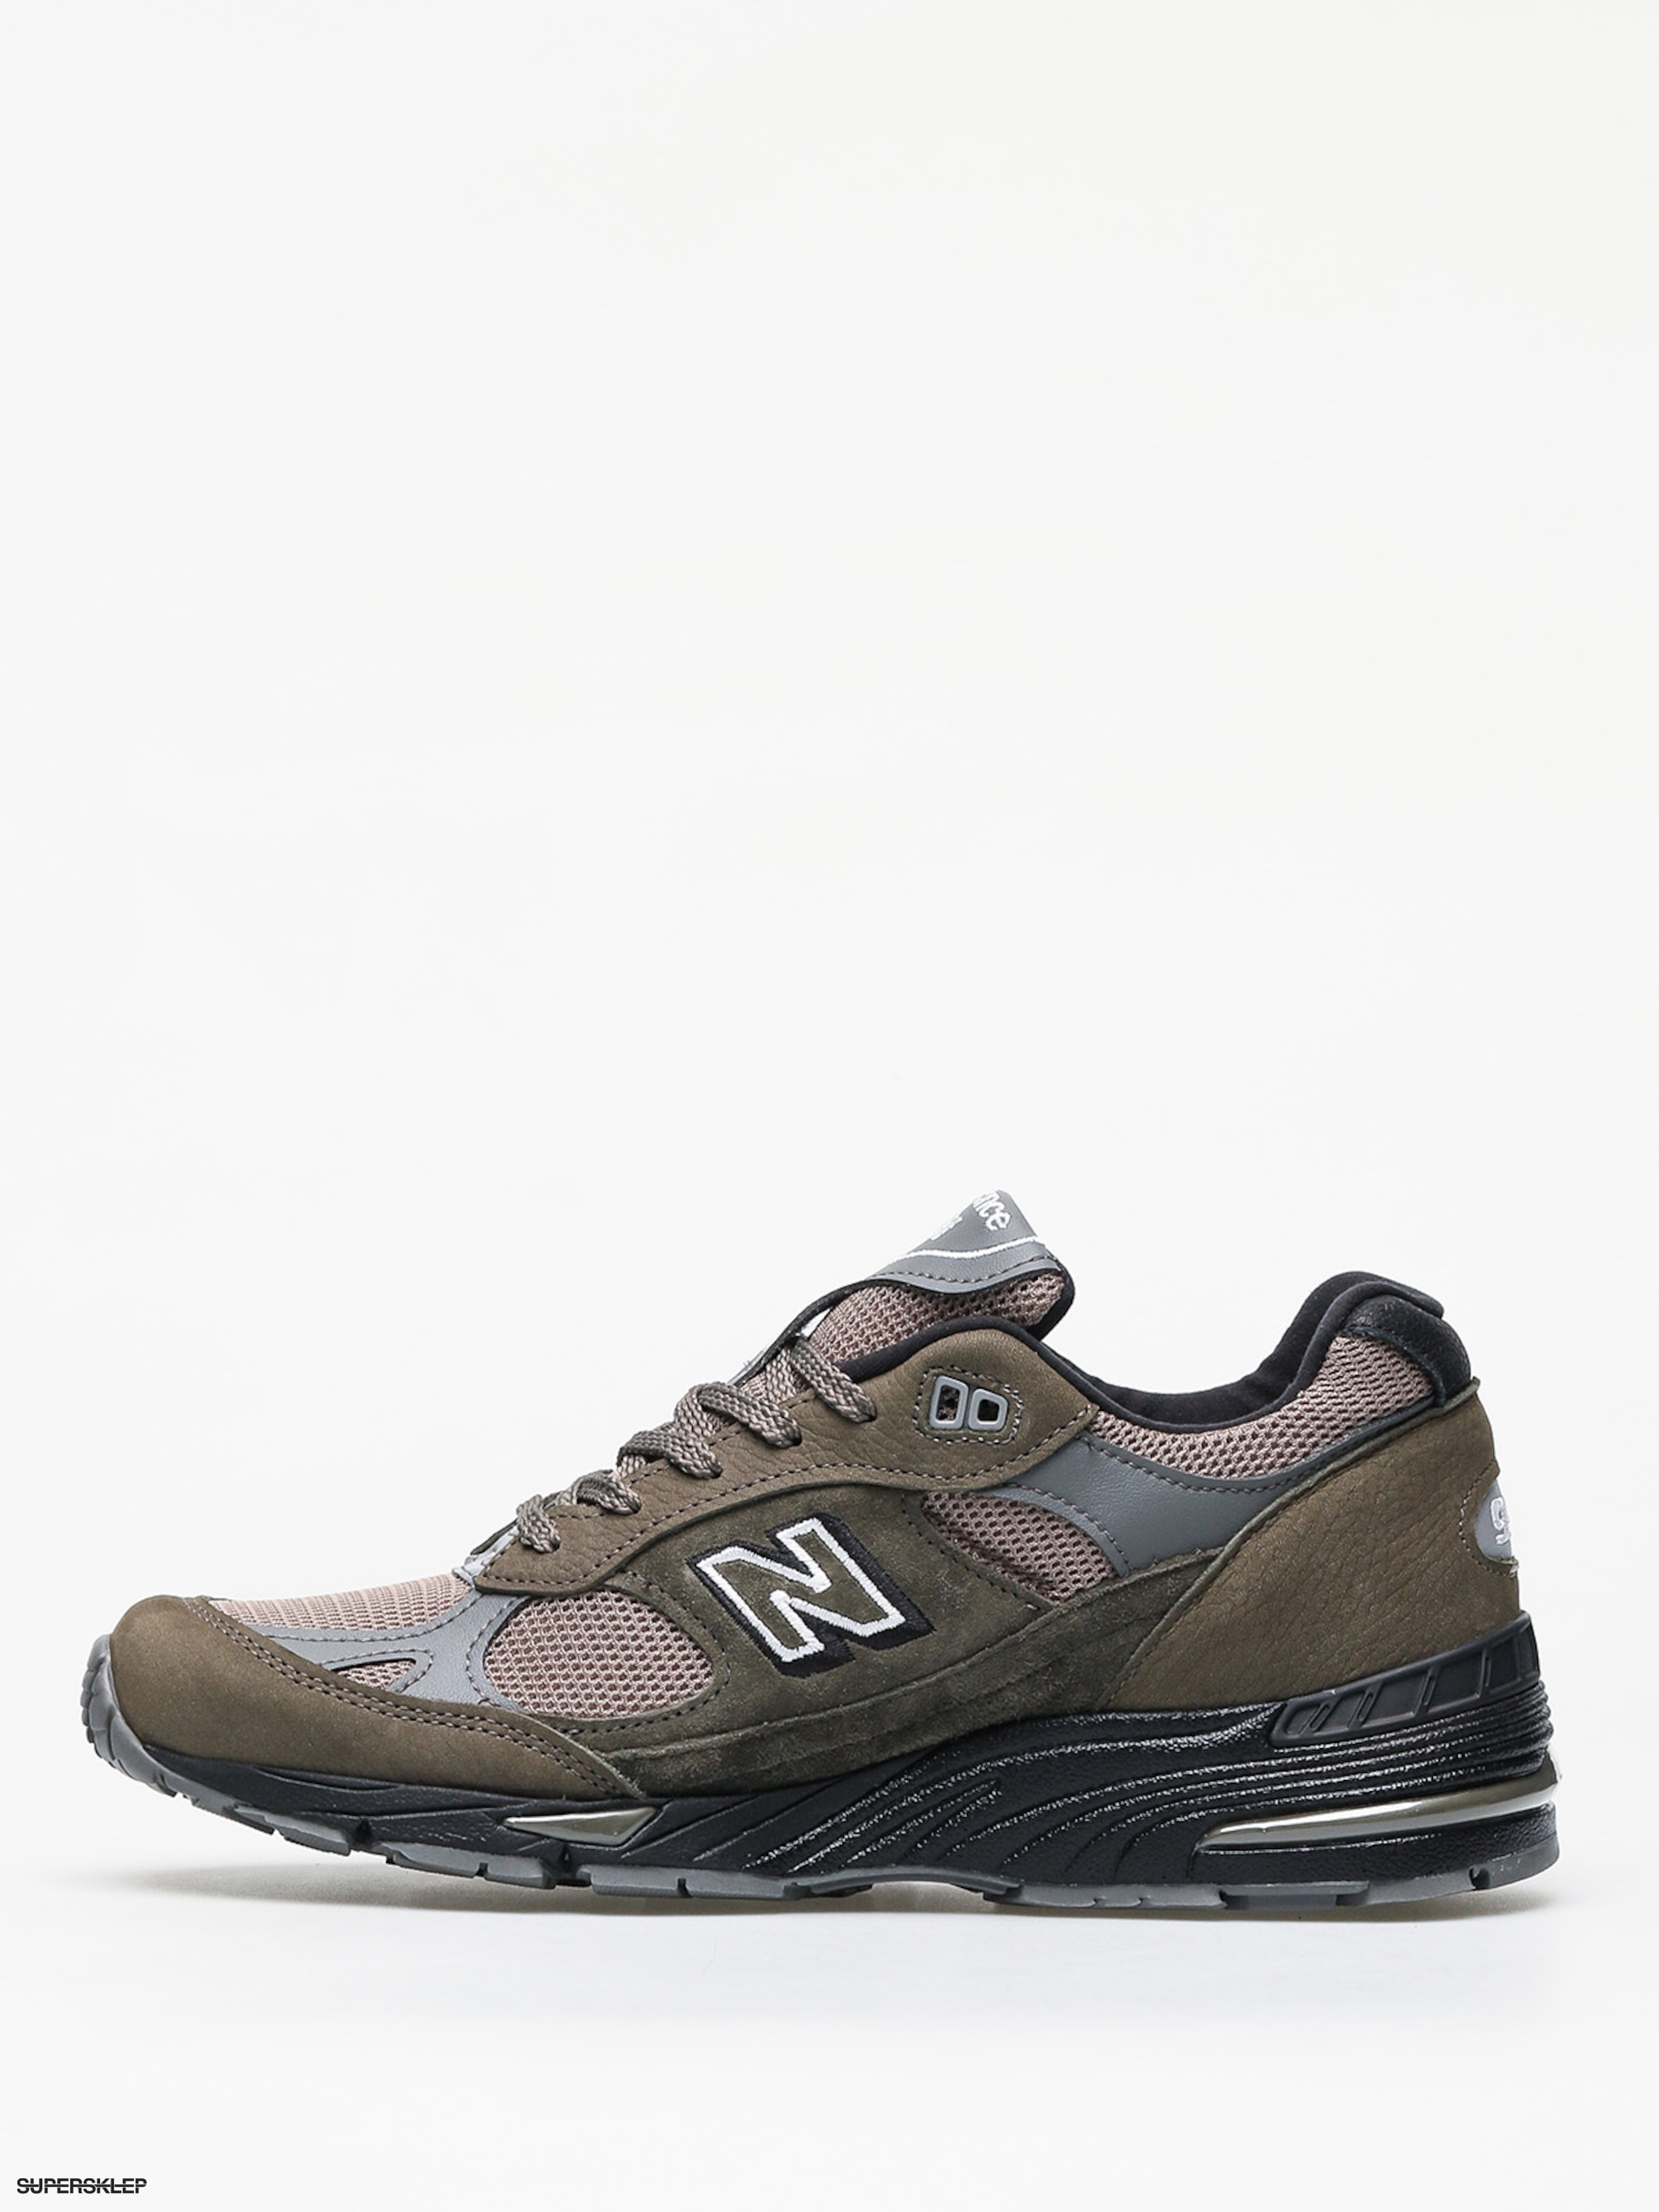 nuove new balance 991